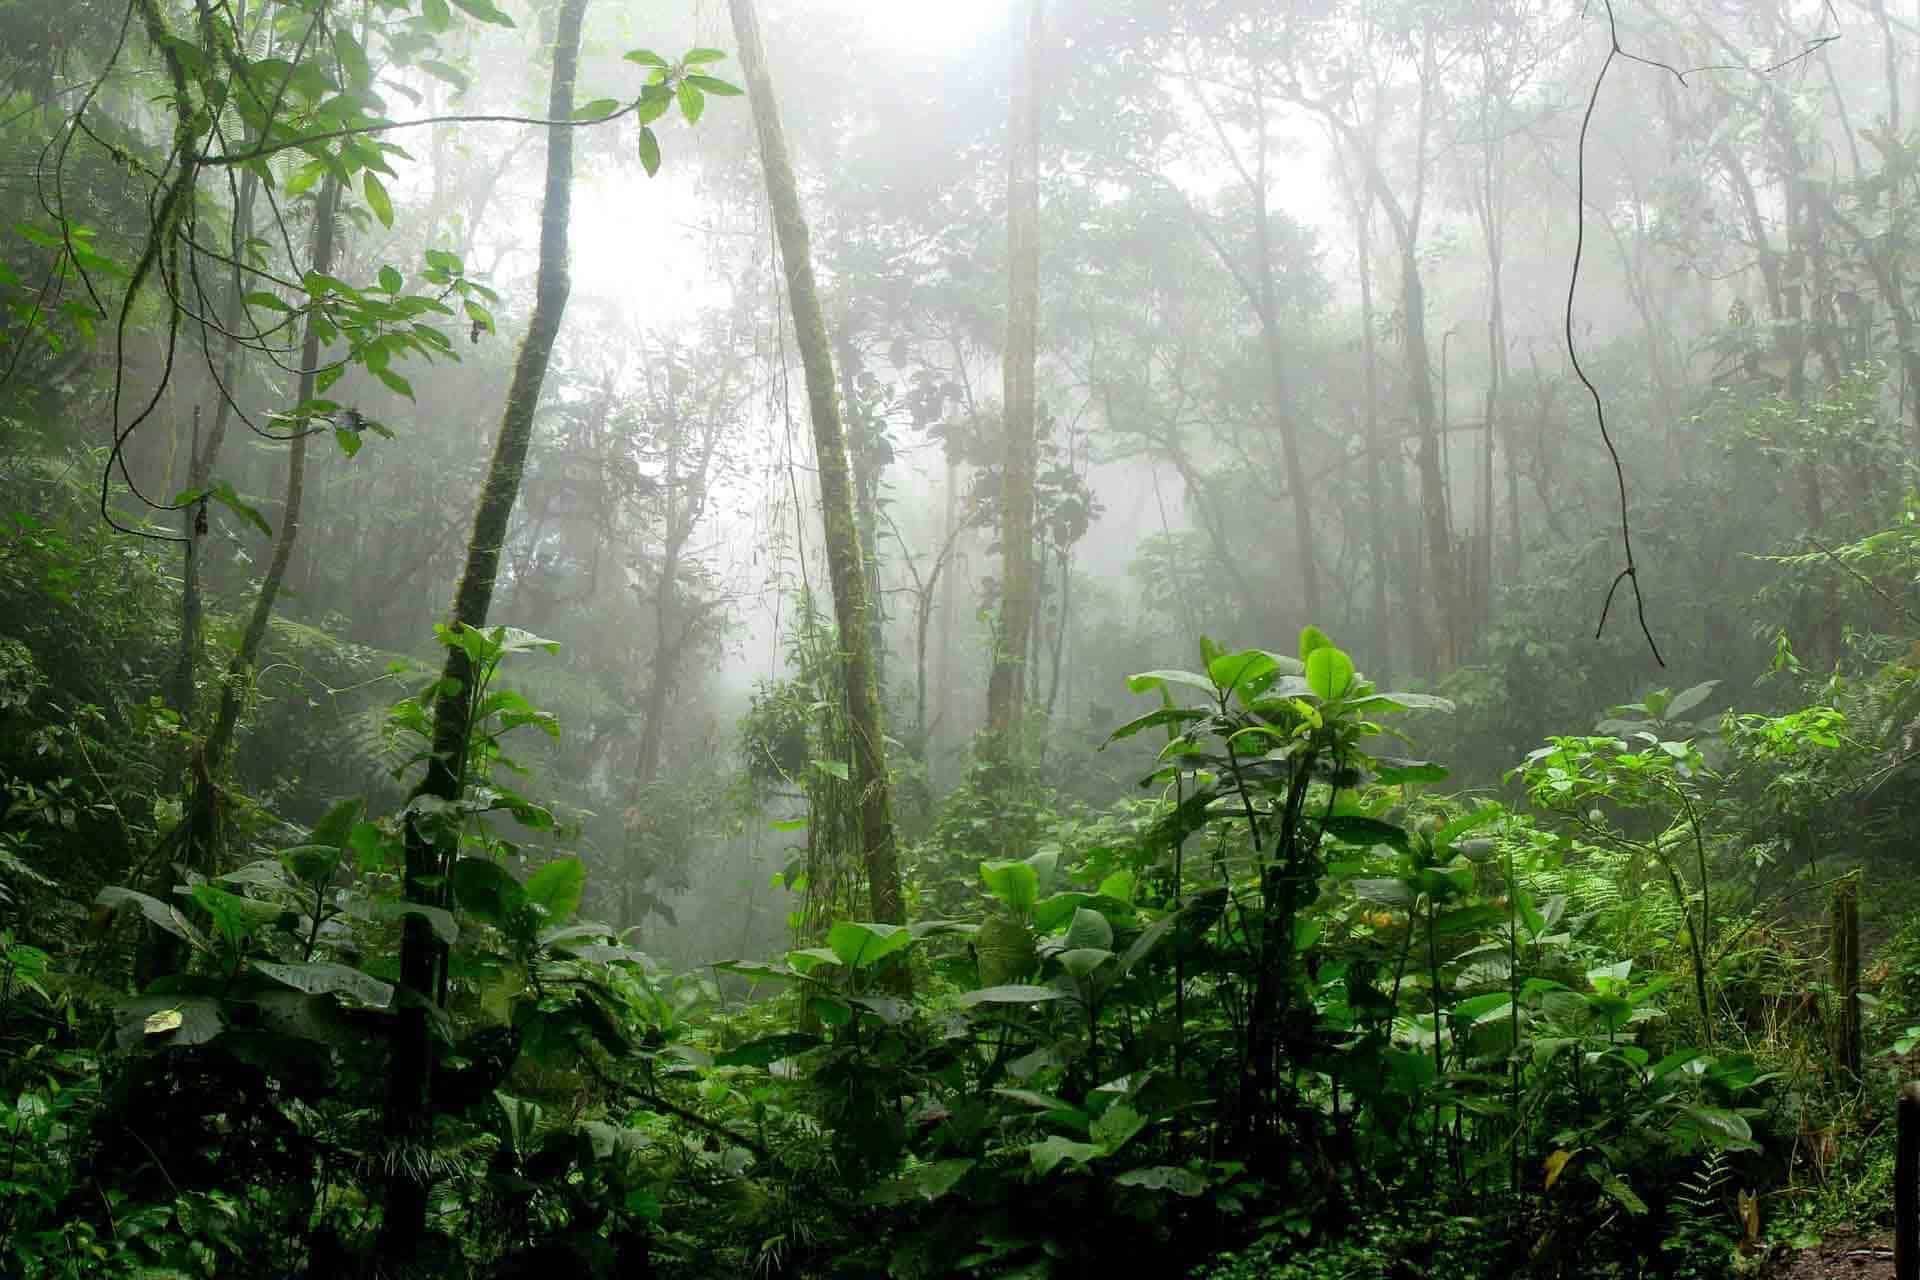 Amazonas-Pexels-David-Riaño-Cortés